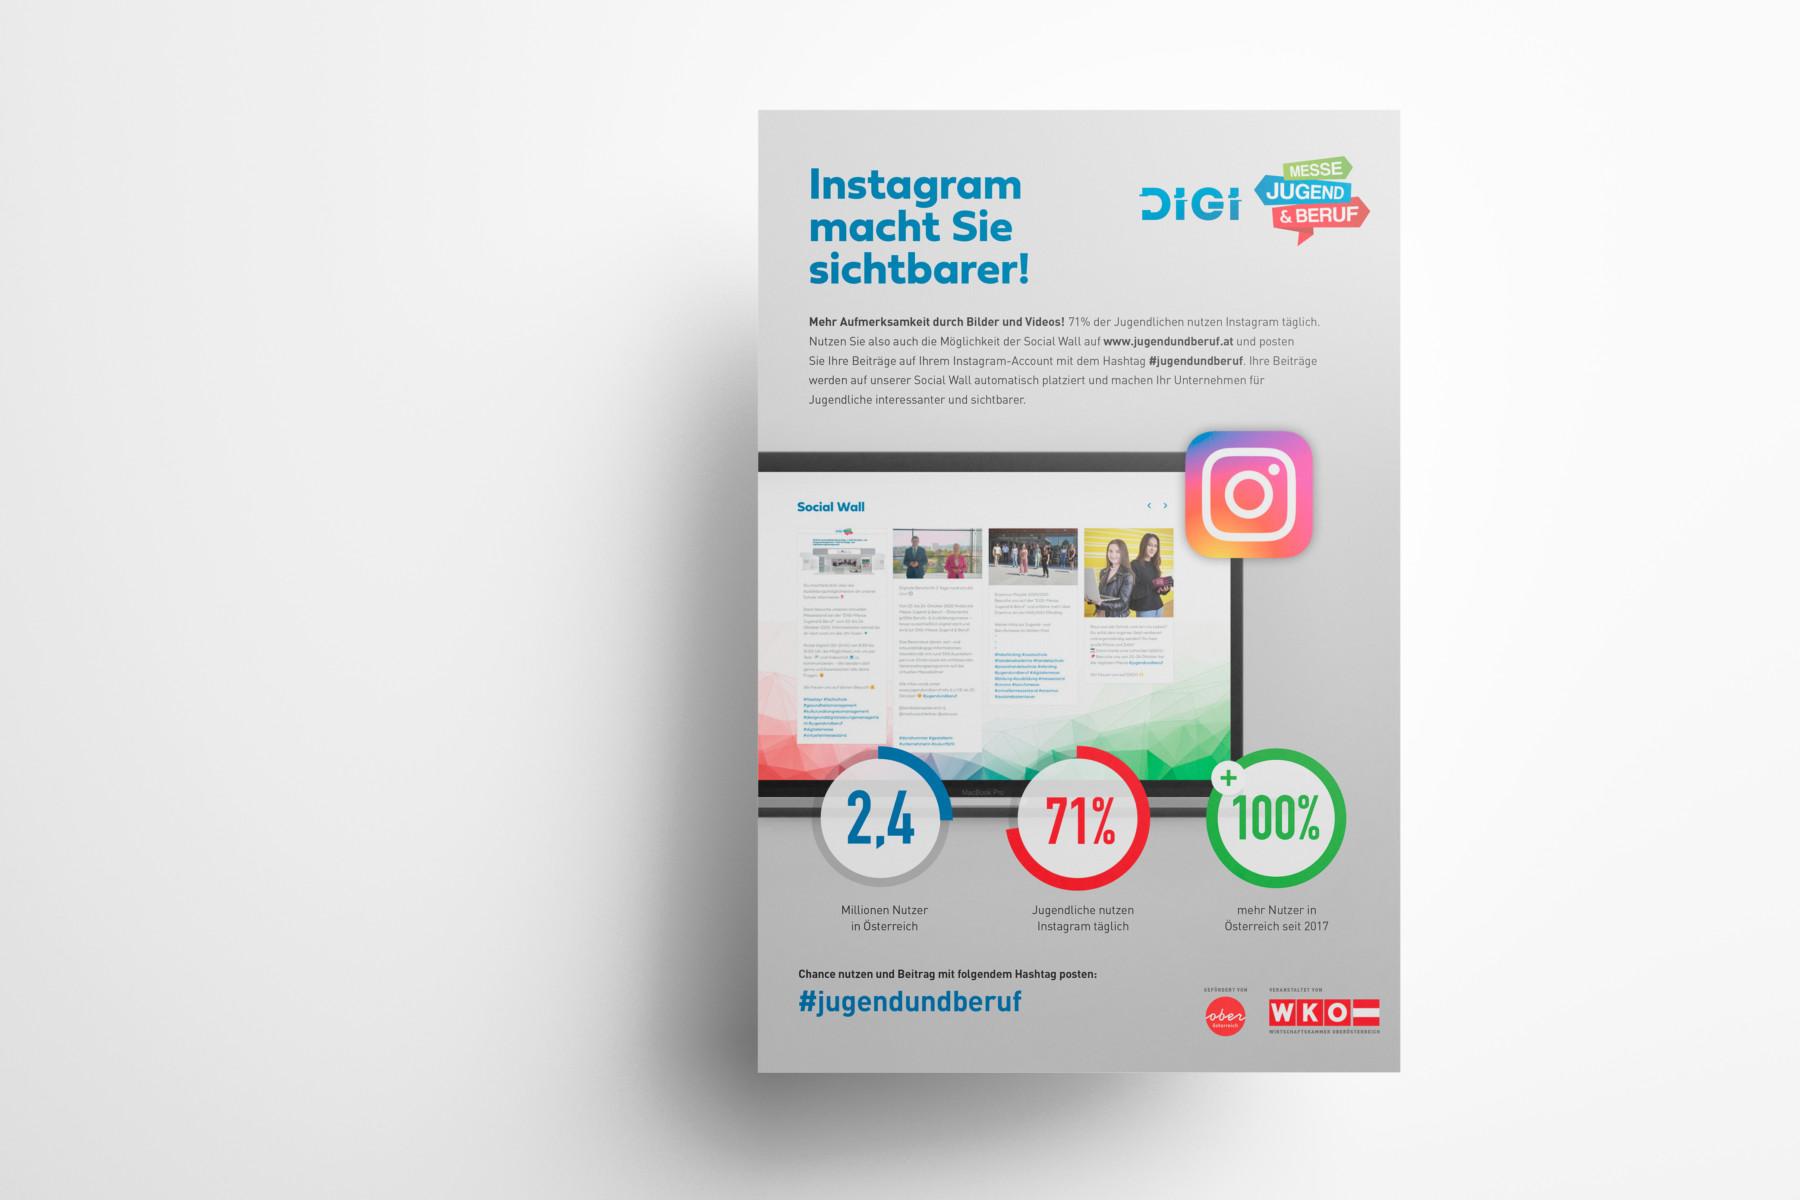 poster-instagram-jub-b2-werbeagentur.jpg